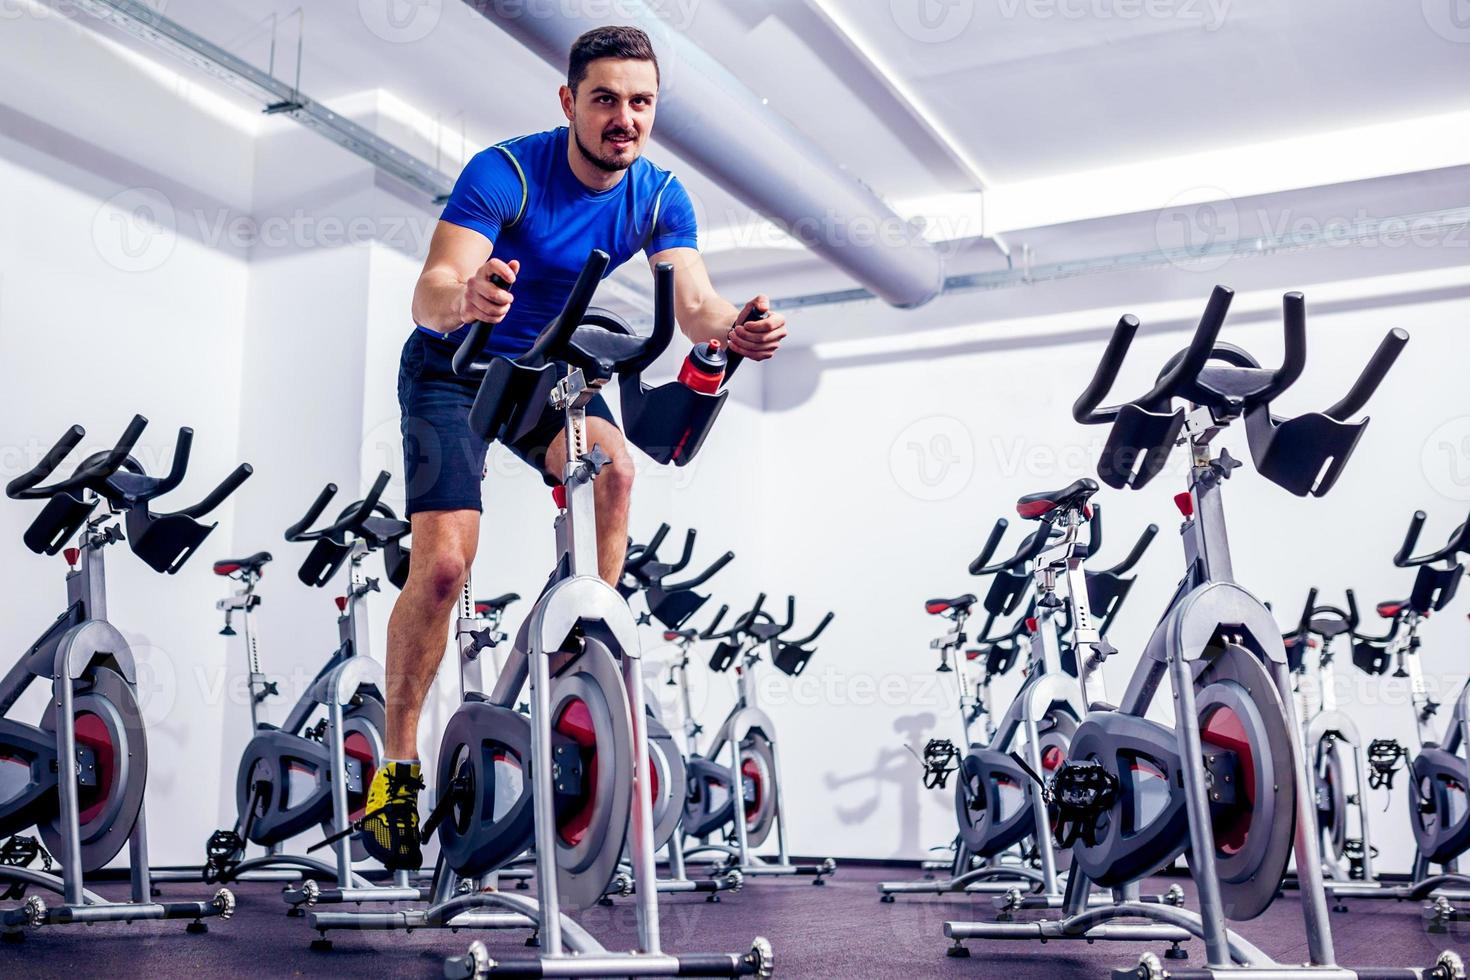 exercising Instructor at Gym photo